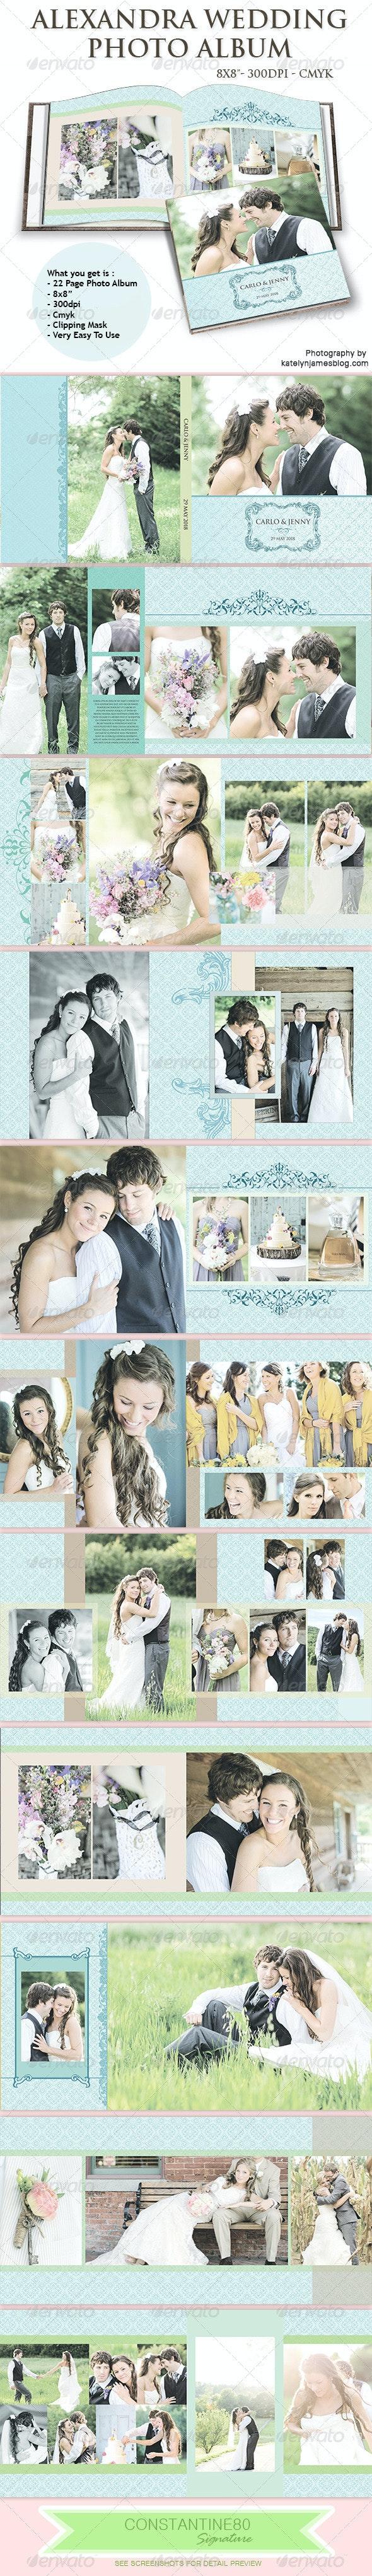 Alexandra Wedding Photo Album - Photo Albums Print Templates